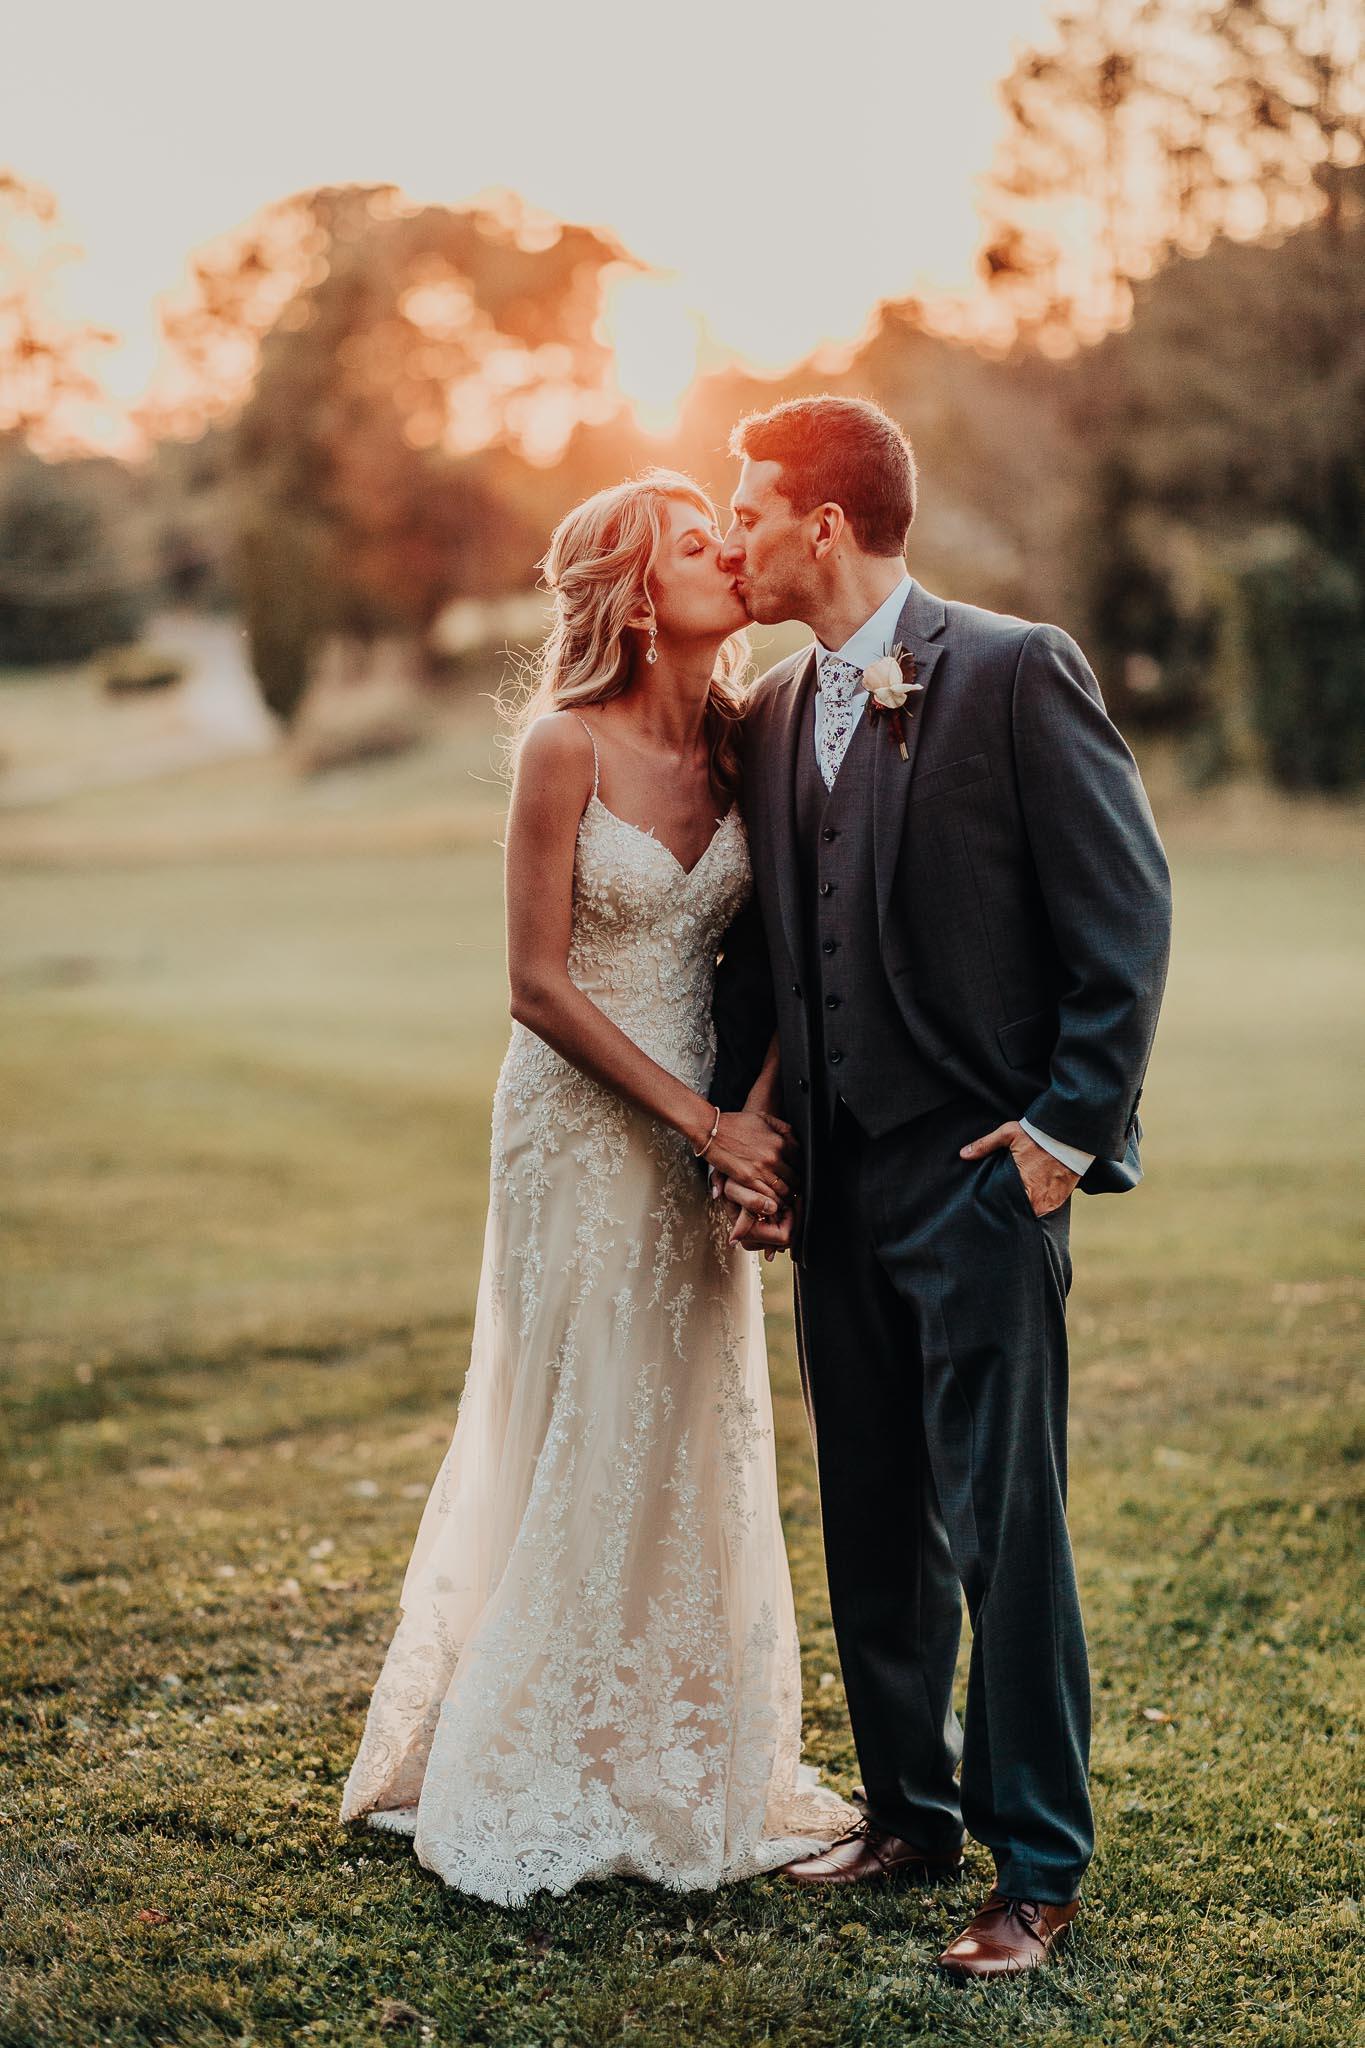 Frosty-Valley-September-Wedding-8433.jpg